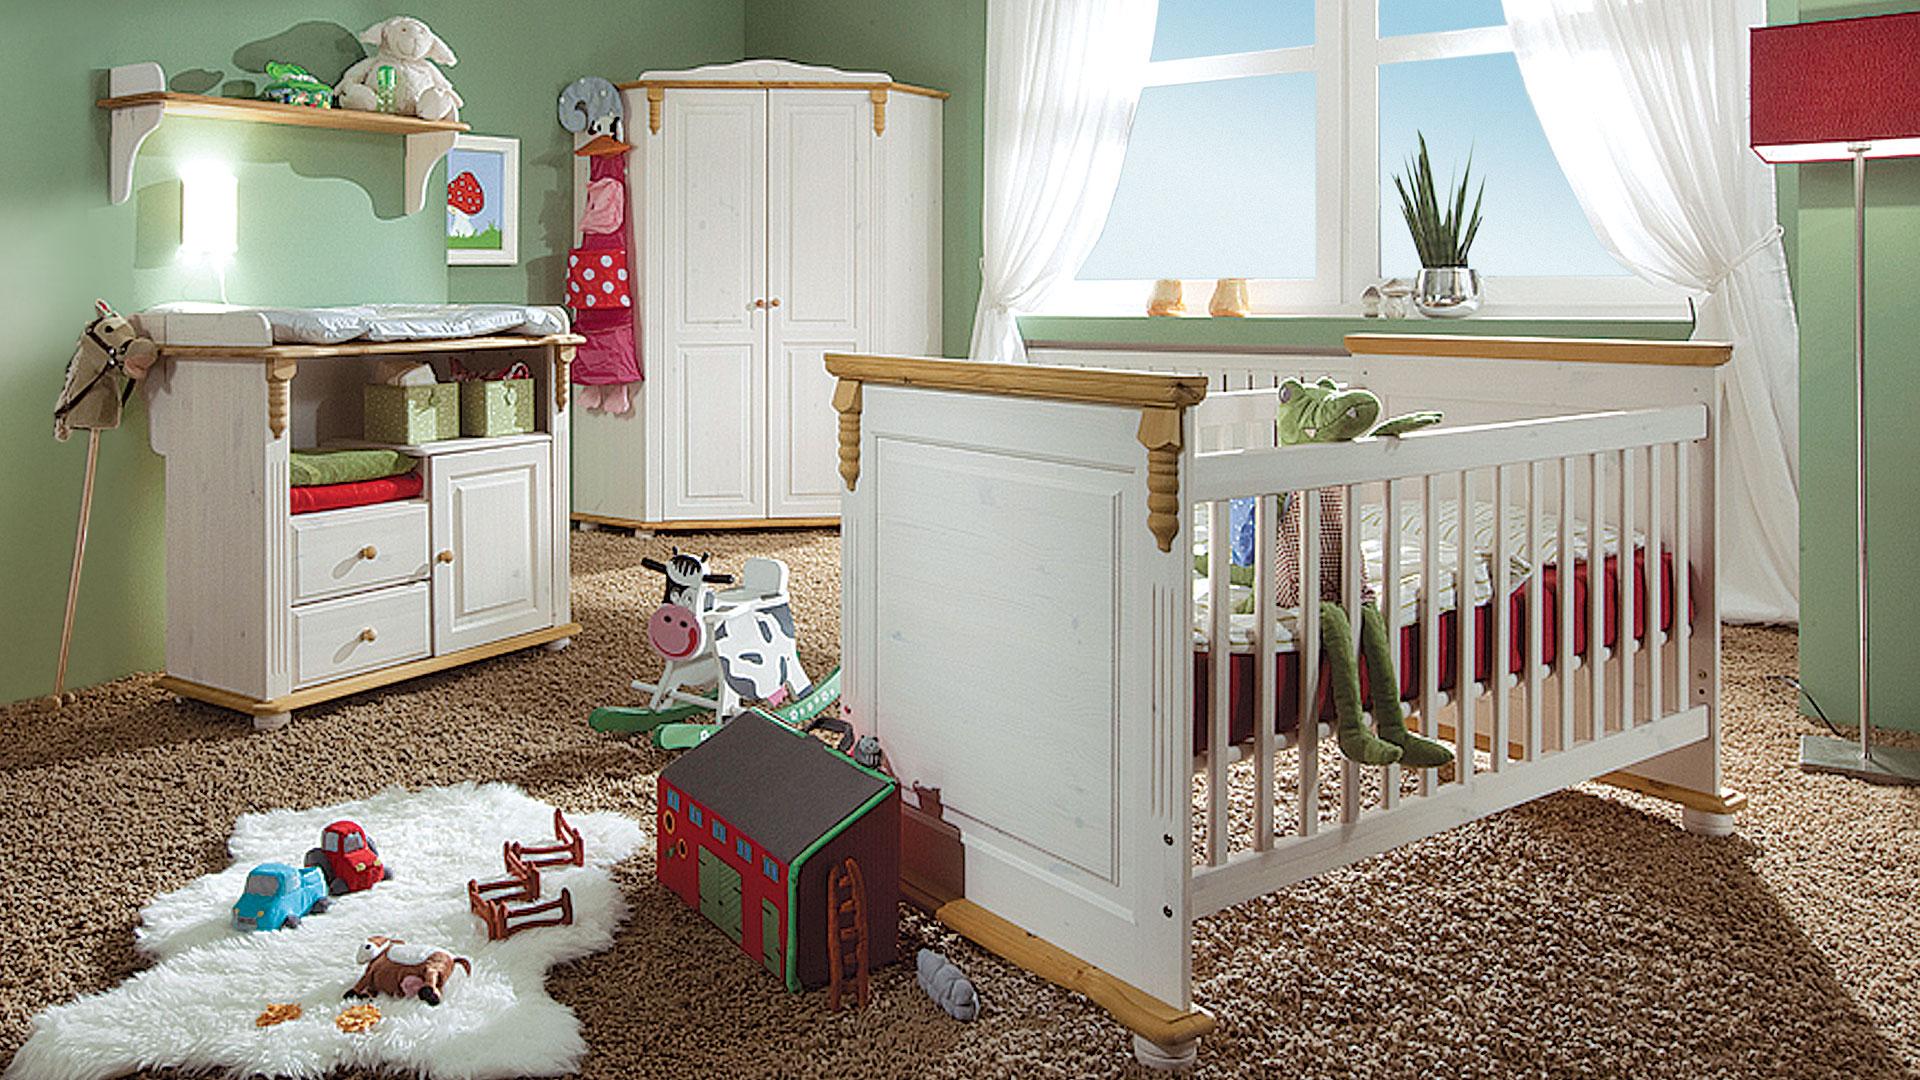 kinderbett riccio. Black Bedroom Furniture Sets. Home Design Ideas